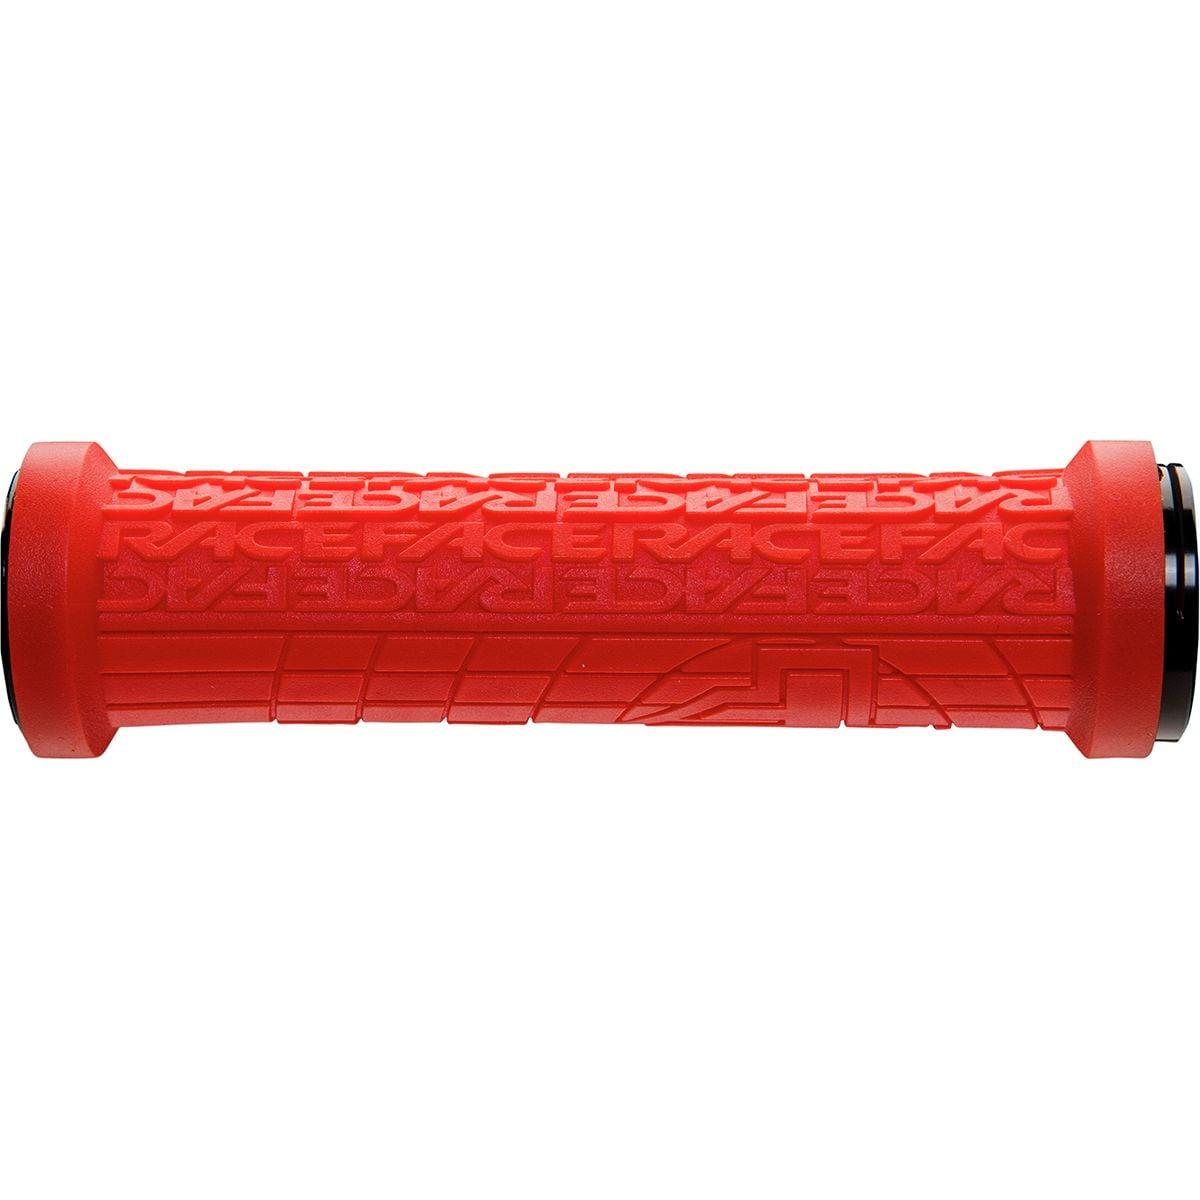 RaceFace Grippler 30mm Lock-On Grip Red